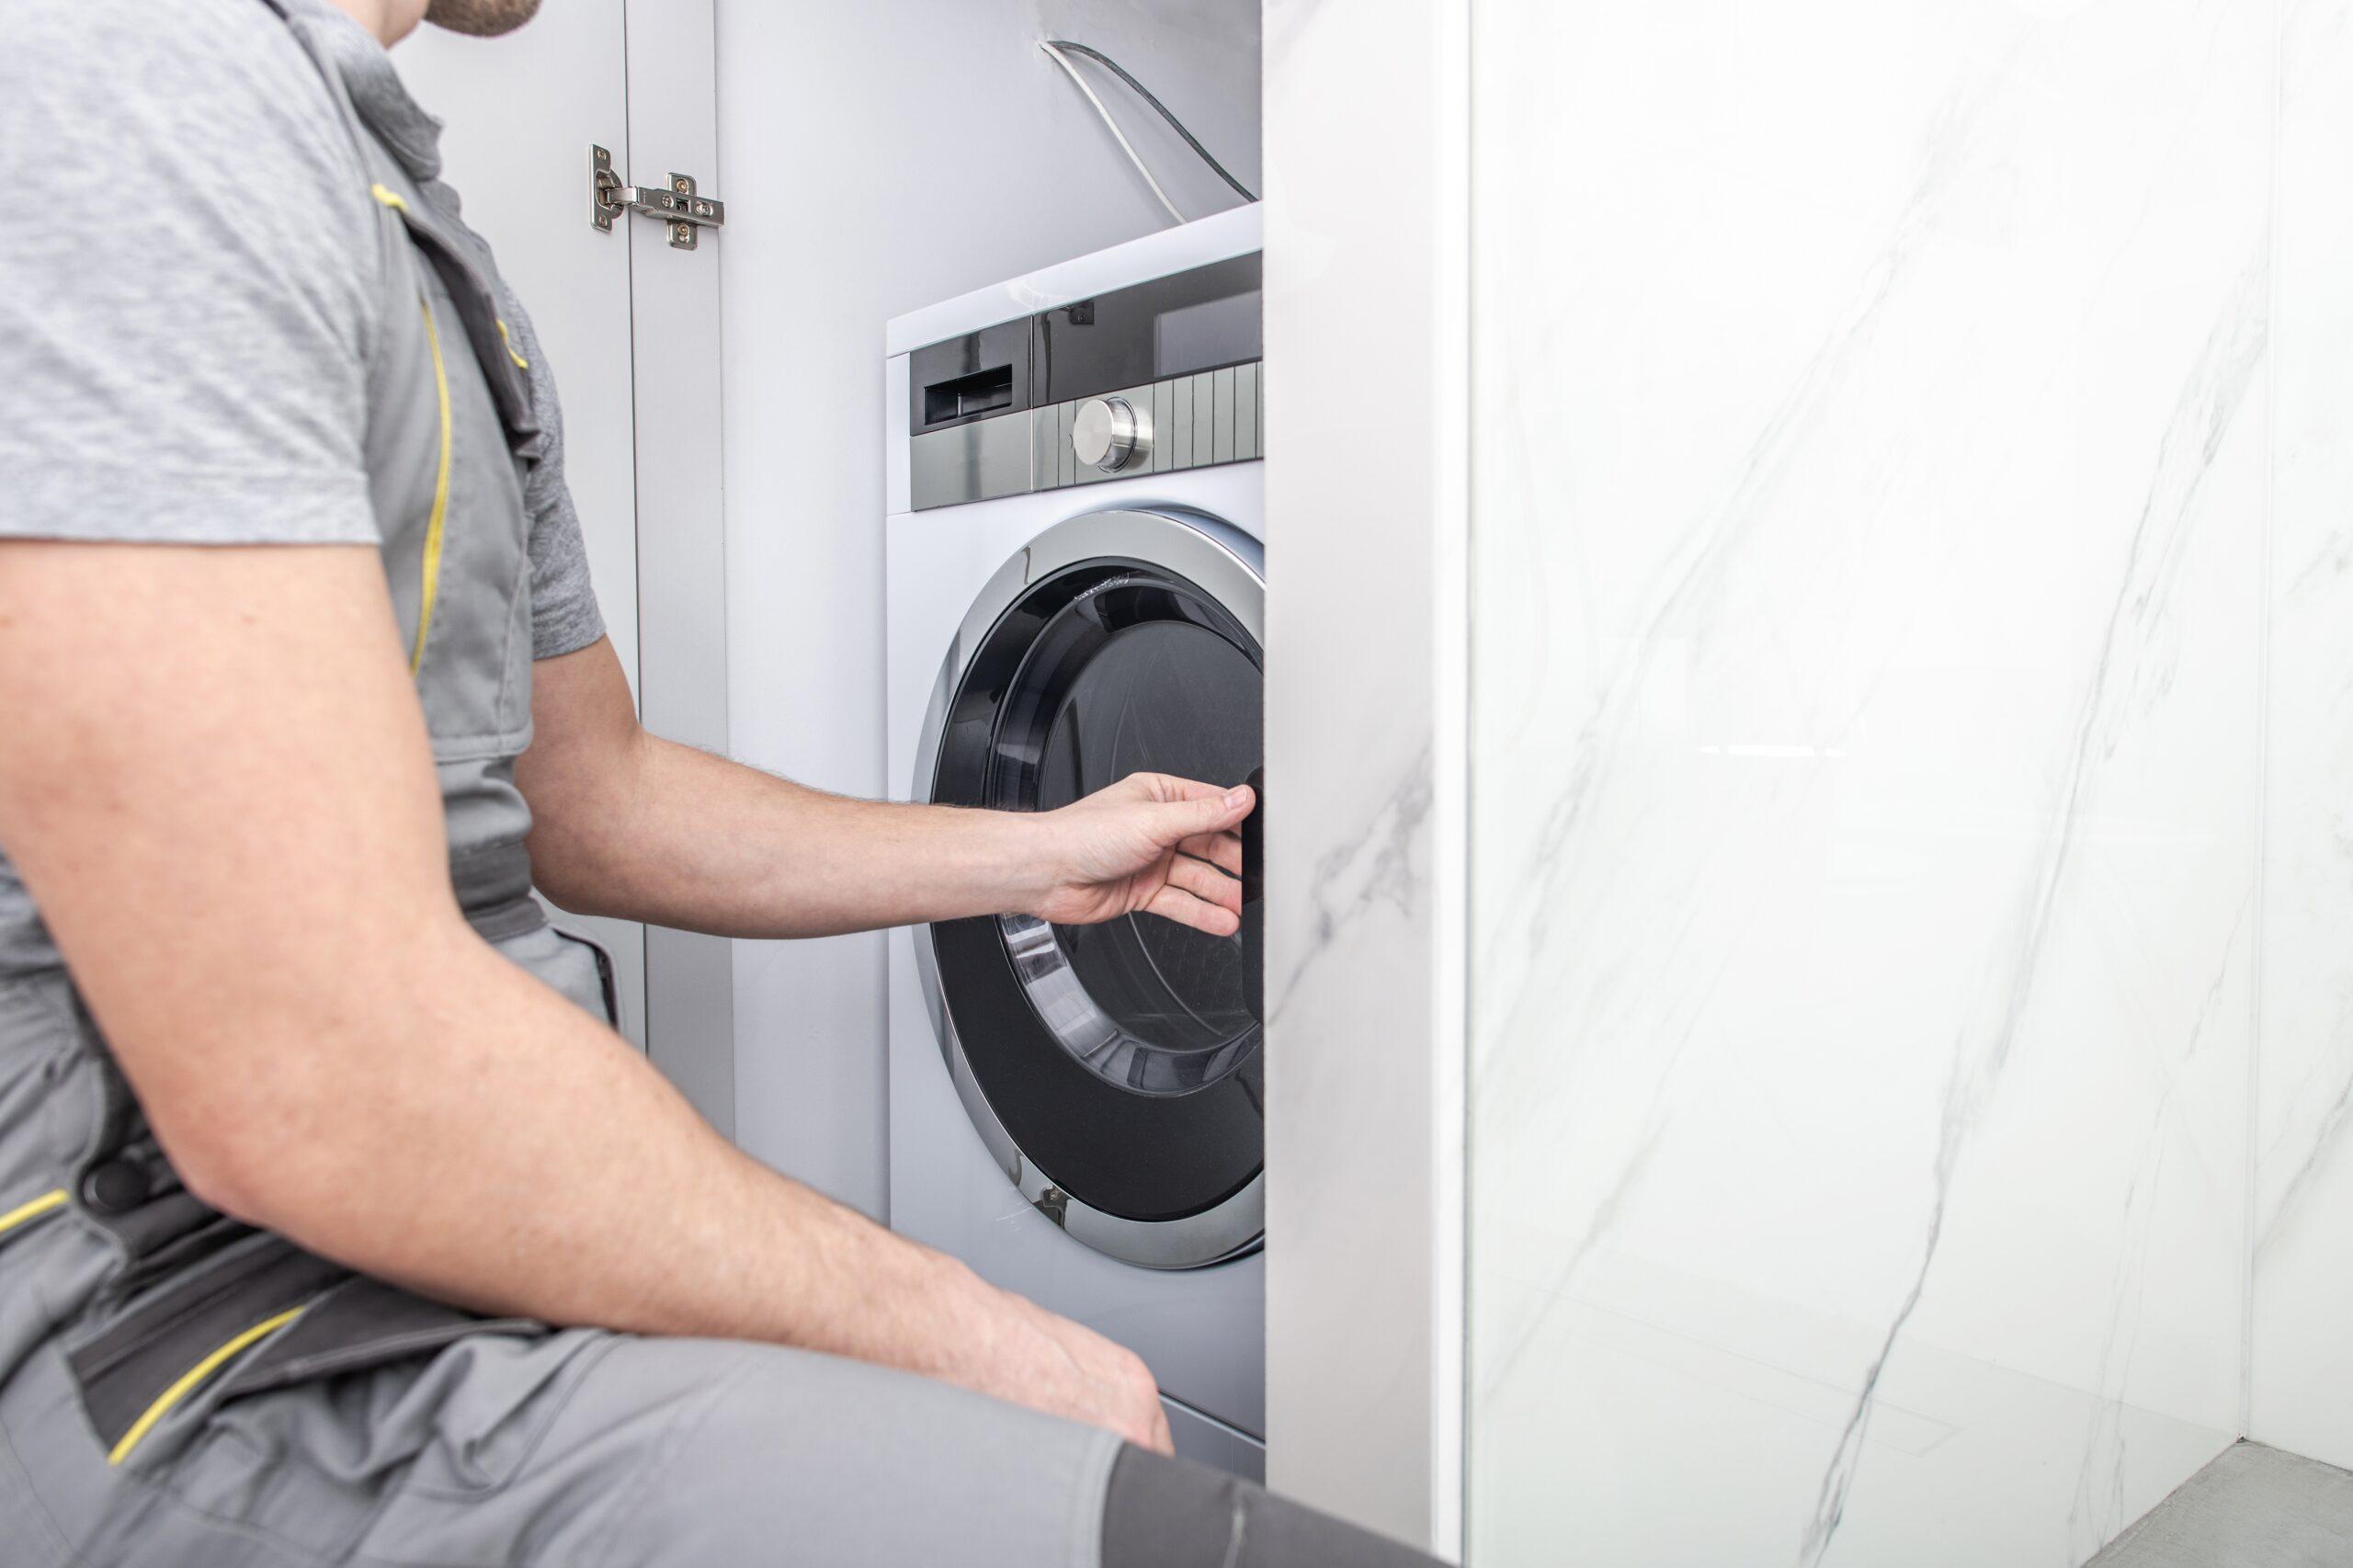 reparo em máquina de lavar lisboa reparo em máquina de lavar roupa lisboa Reparo em Máquina de Lavar Roupa Lisboa washing machine installation 8ND4GFP scaled